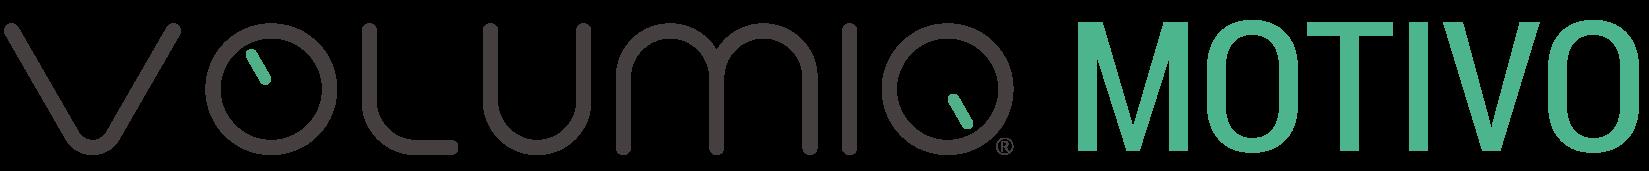 volumio-motivo-logo